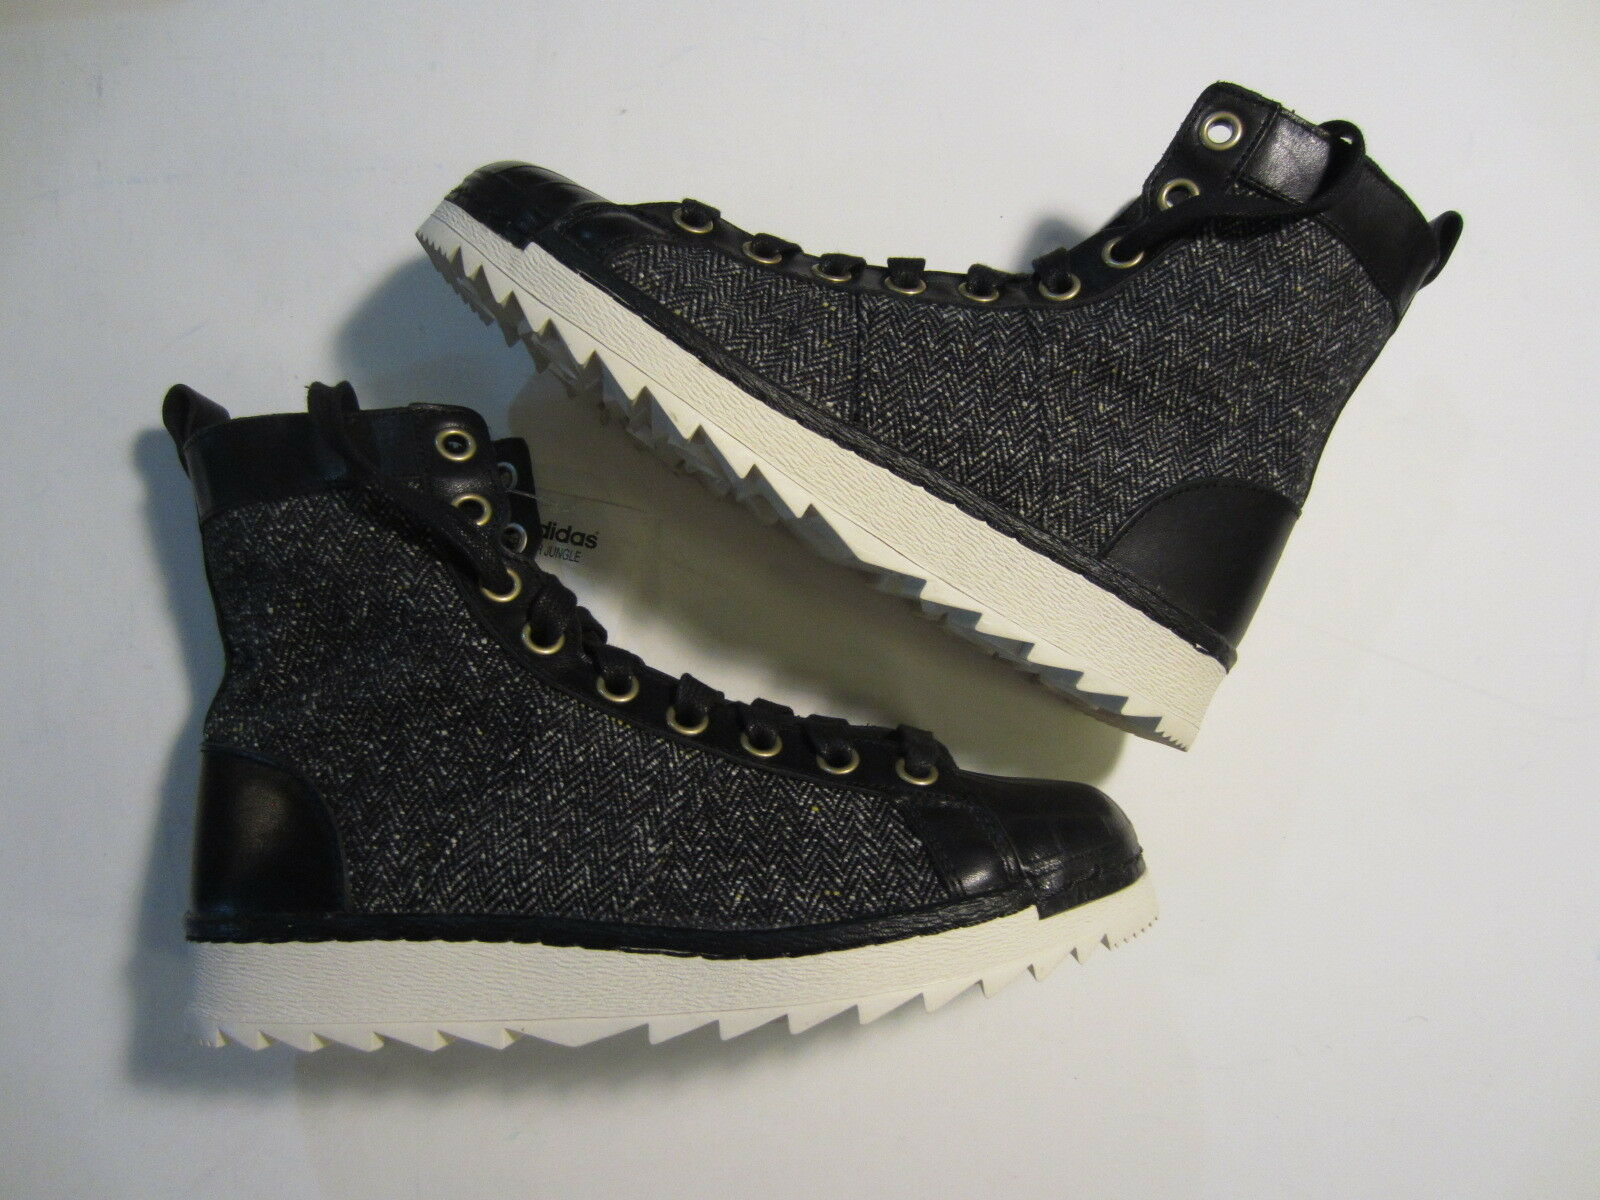 NEW Adidas Superstar Jungle Originals mens high boot shoe B35229 black 7 - 8.5